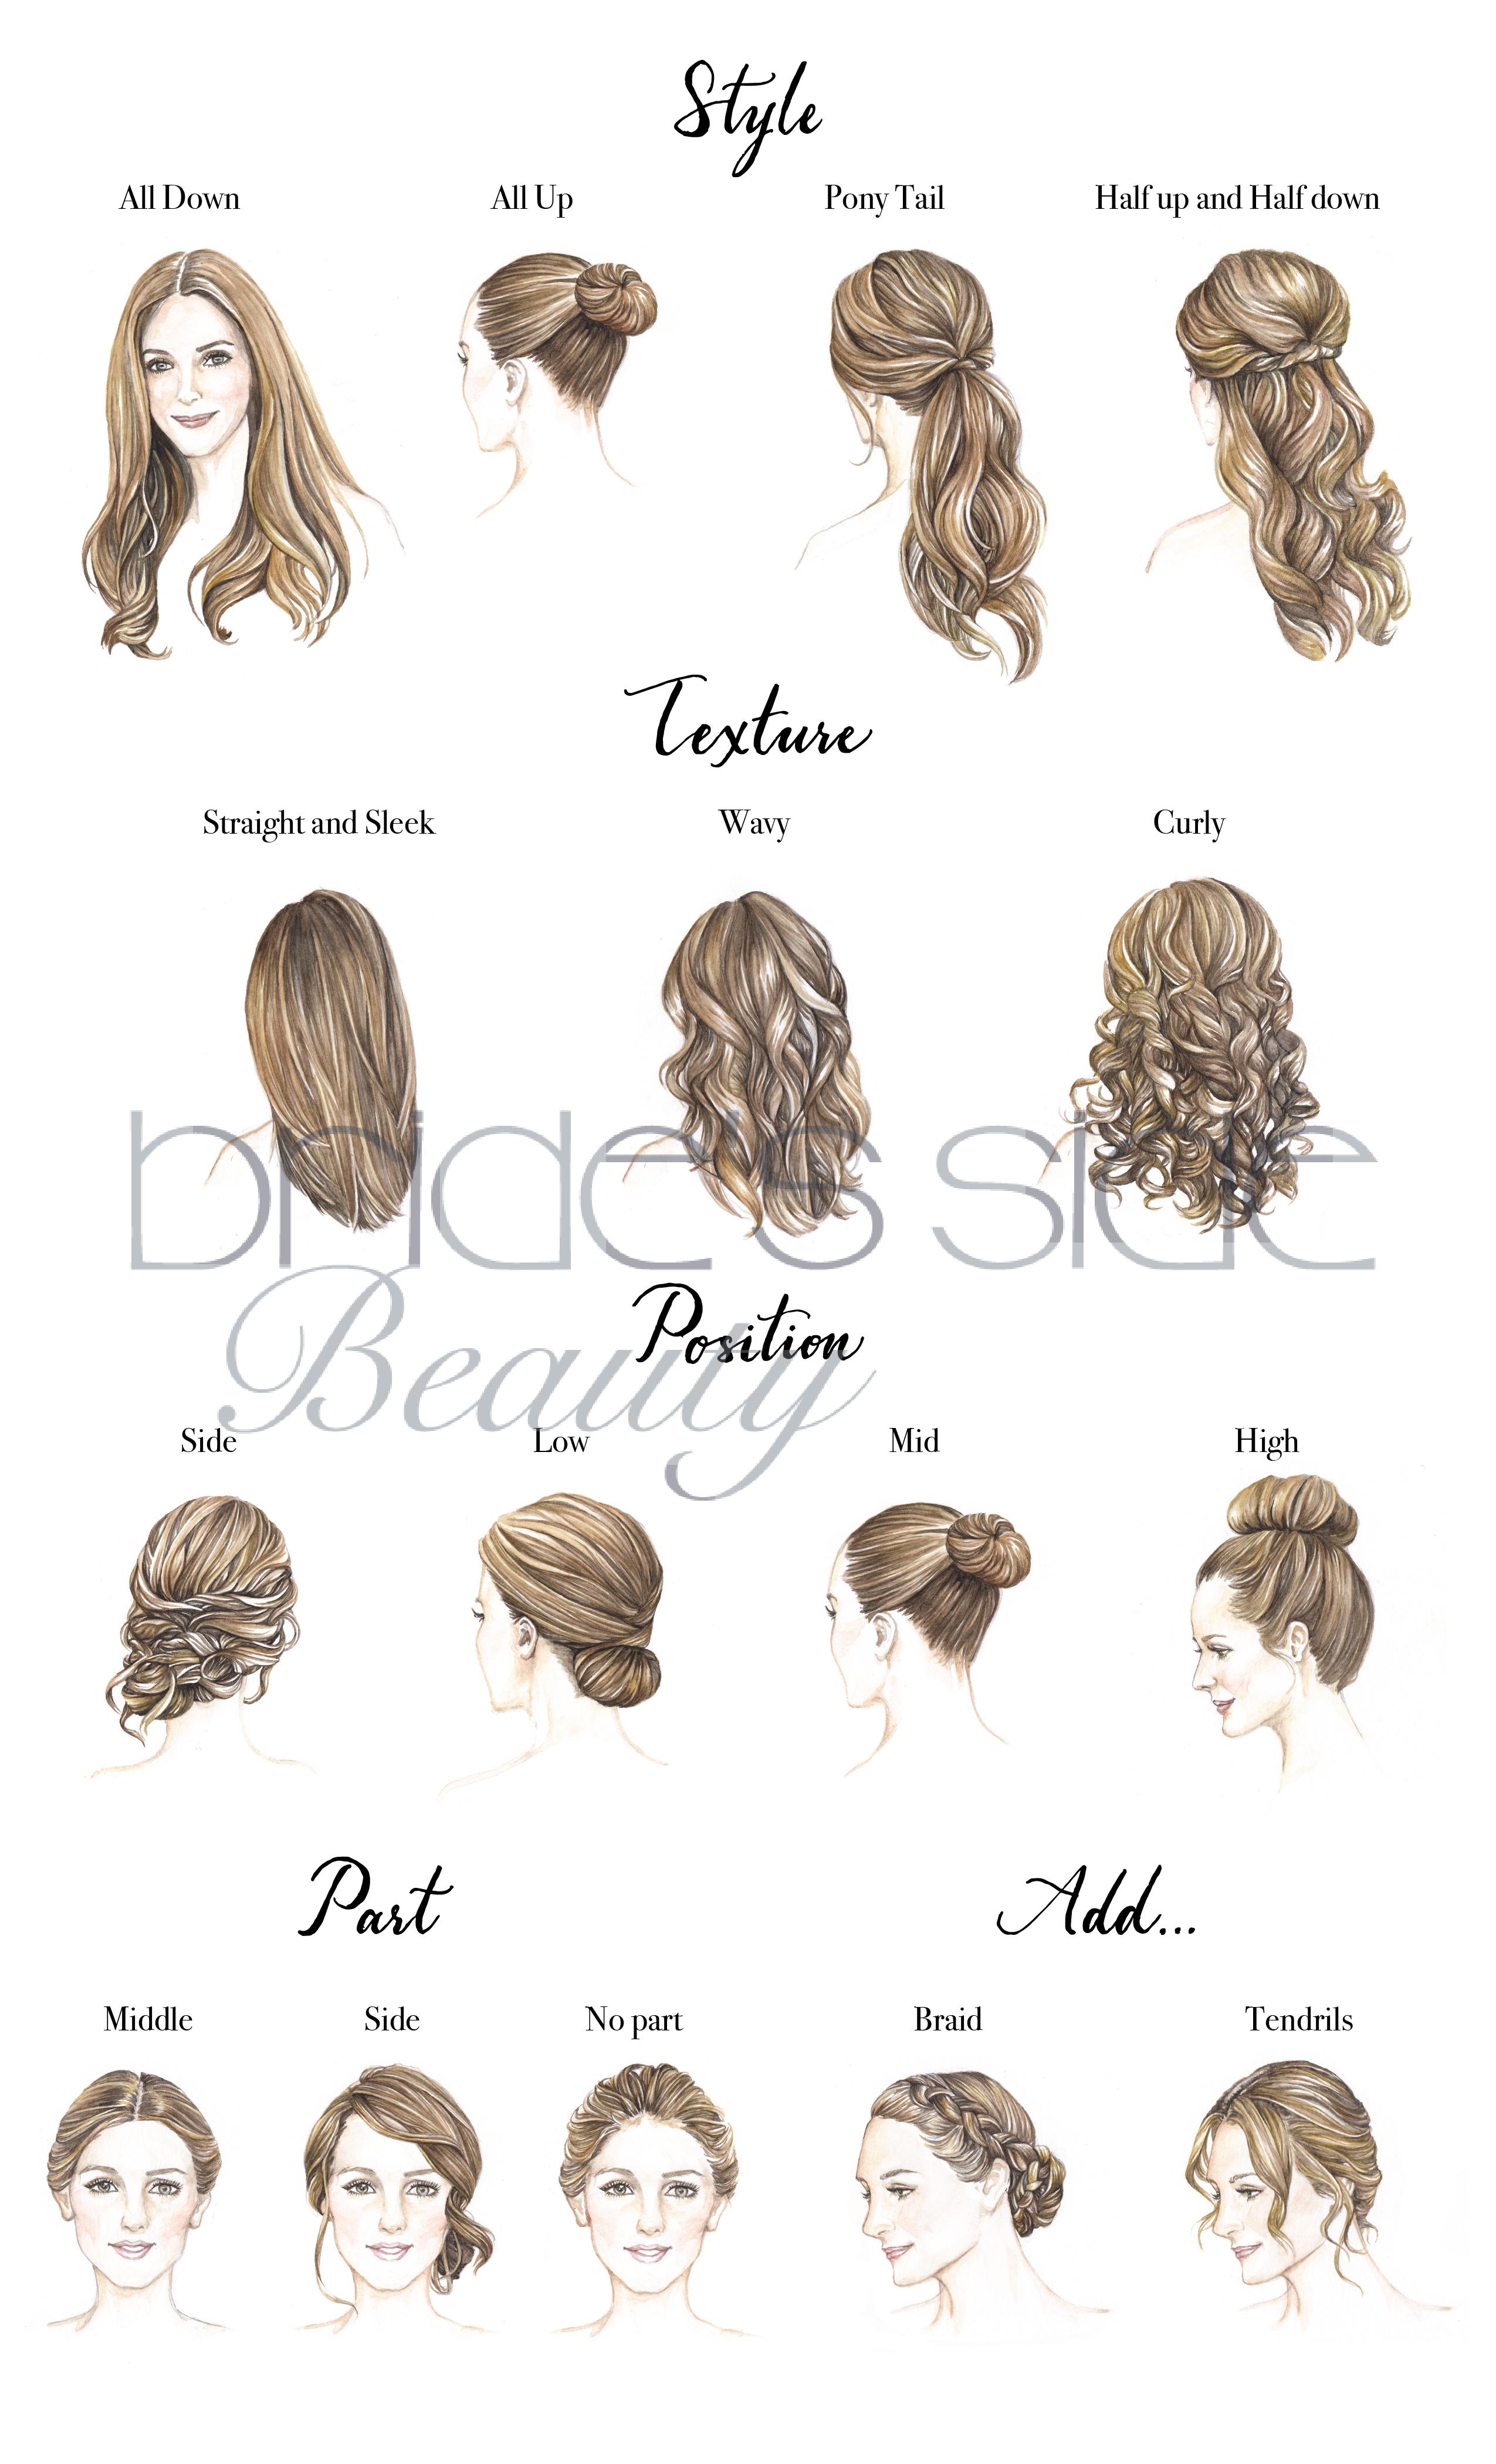 Wedding Hair Illustration Front View Google Search Wedding Hair Front Bridal Hair Half Up Wedding Hairstyles Half Up Half Down